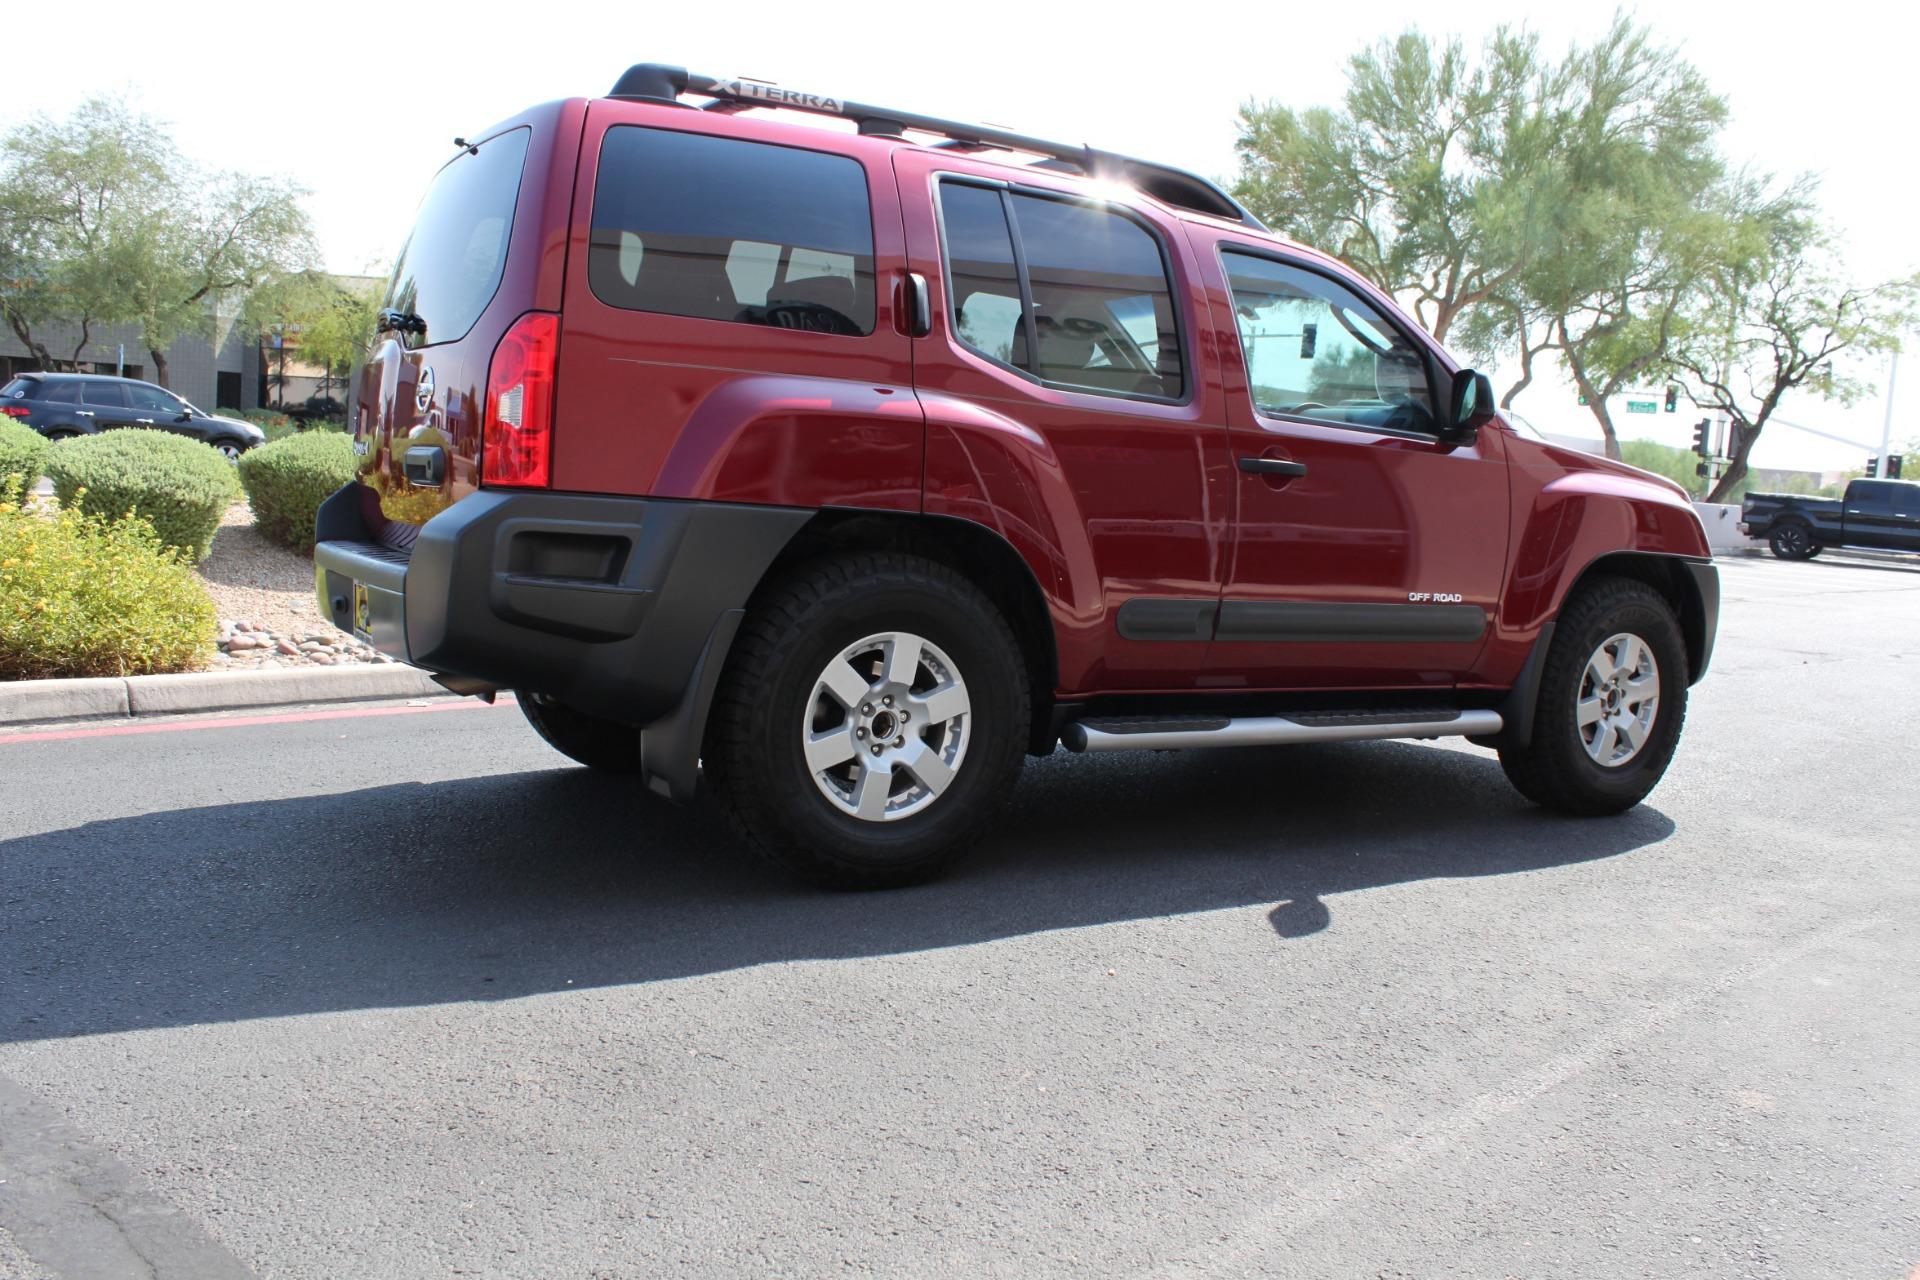 Used-2006-Nissan-Xterra-Off-Road-Fiat